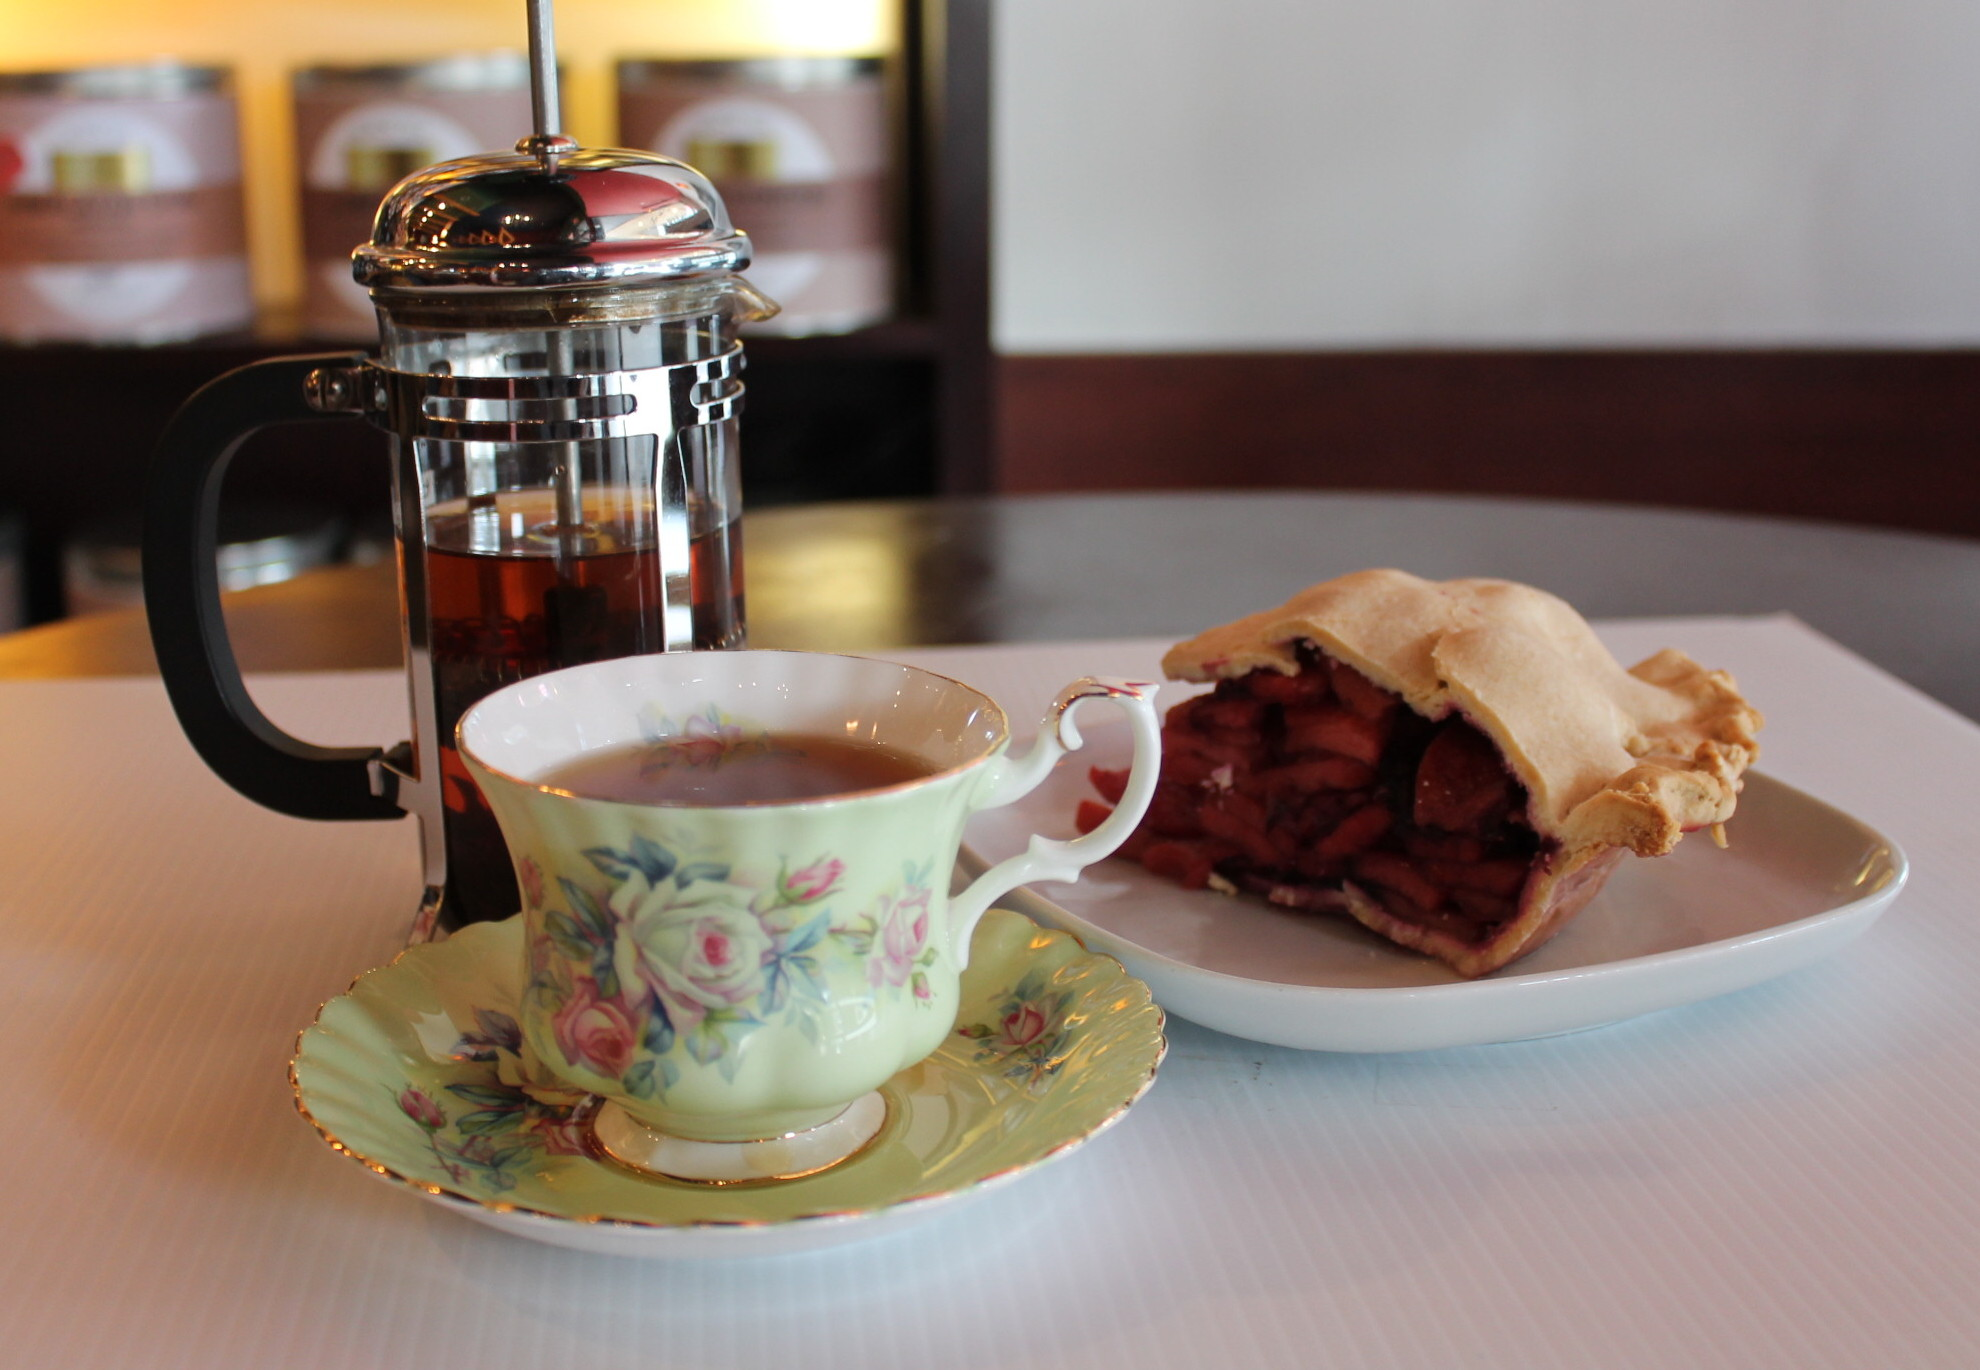 Image: Pekoe Tea Lounge / Facebook